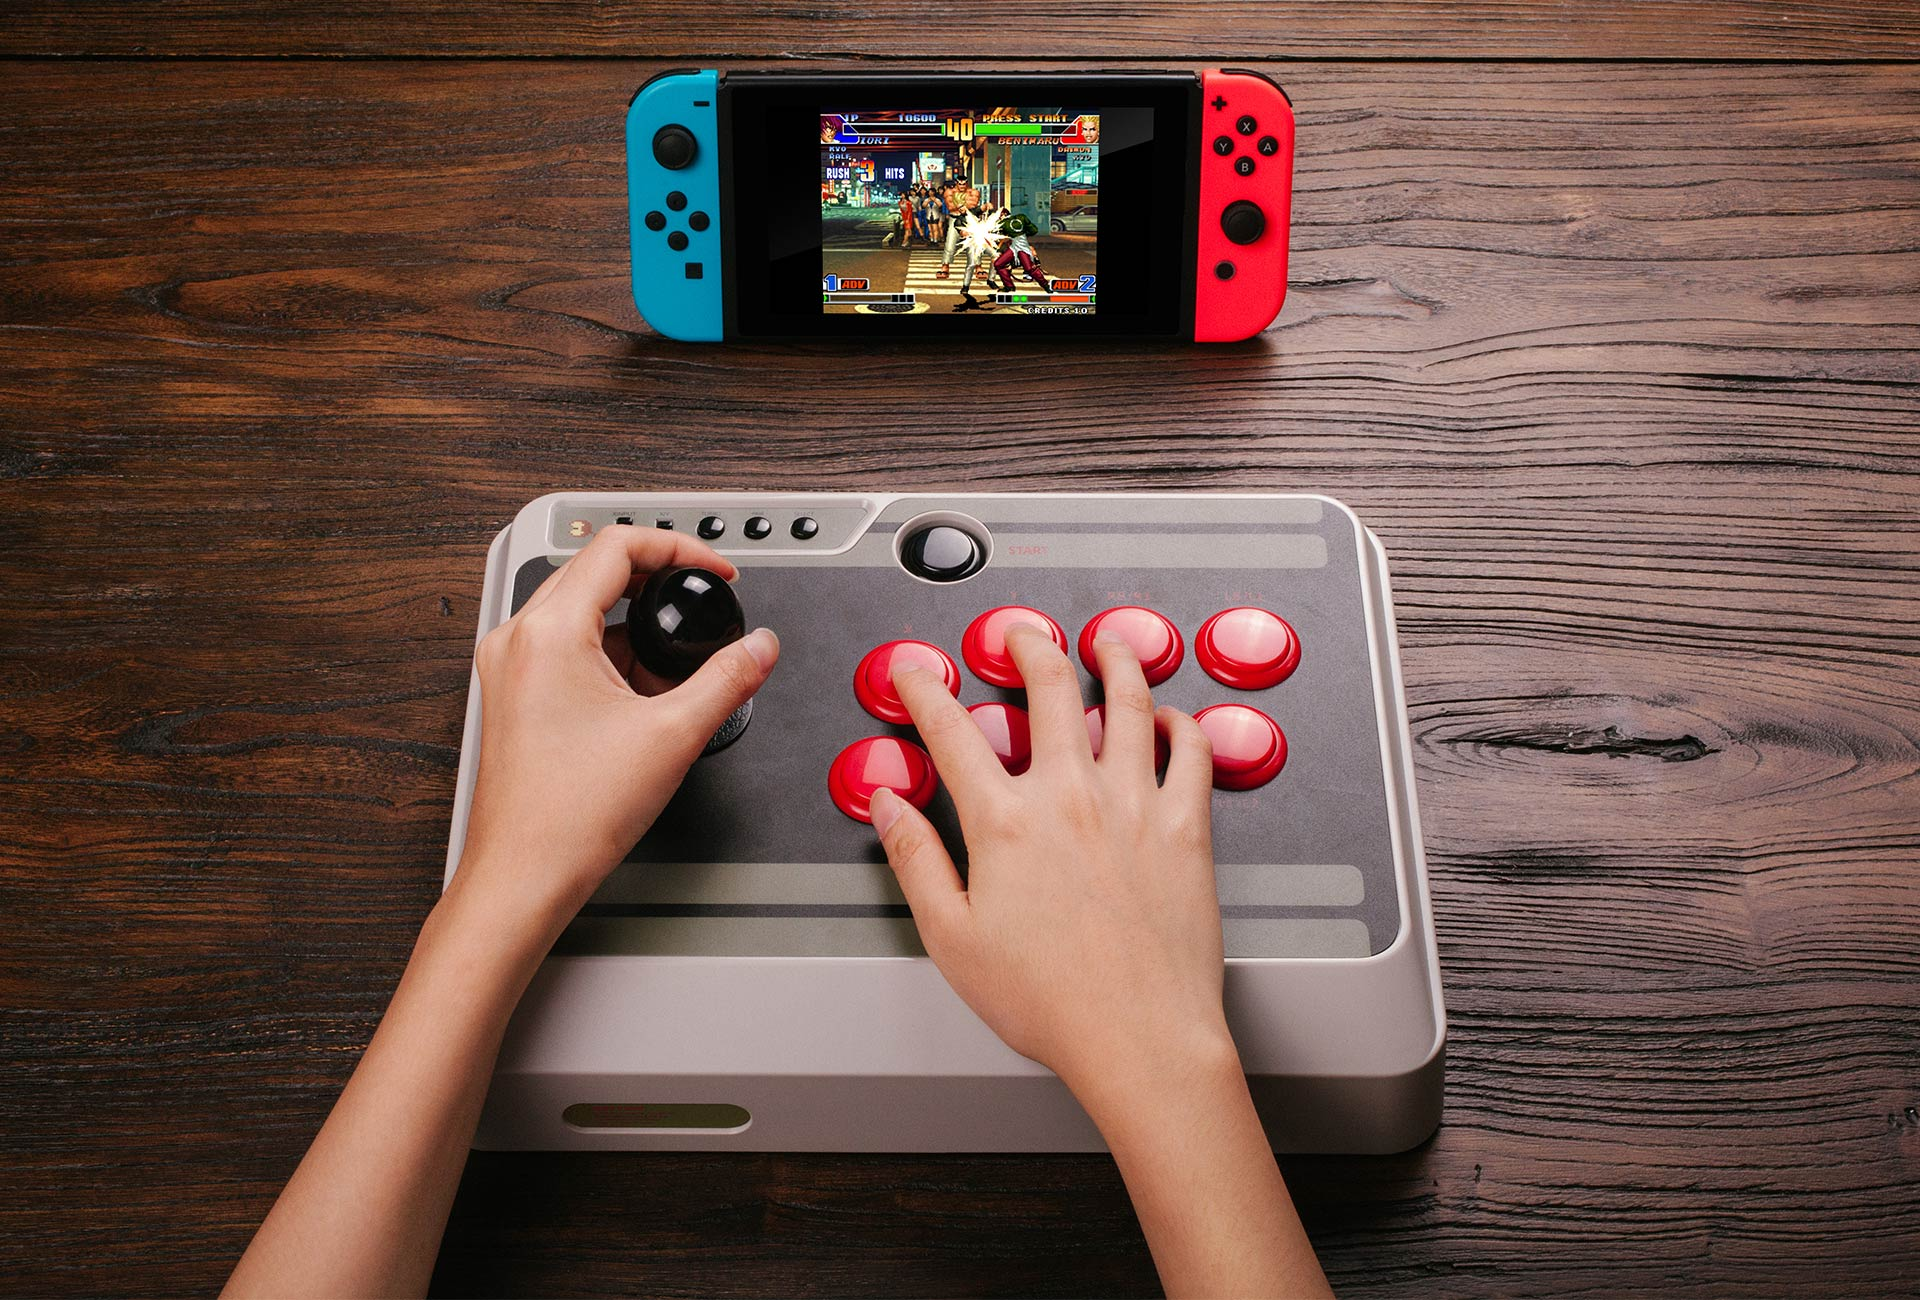 N30 Arcade Stick 8bitdo